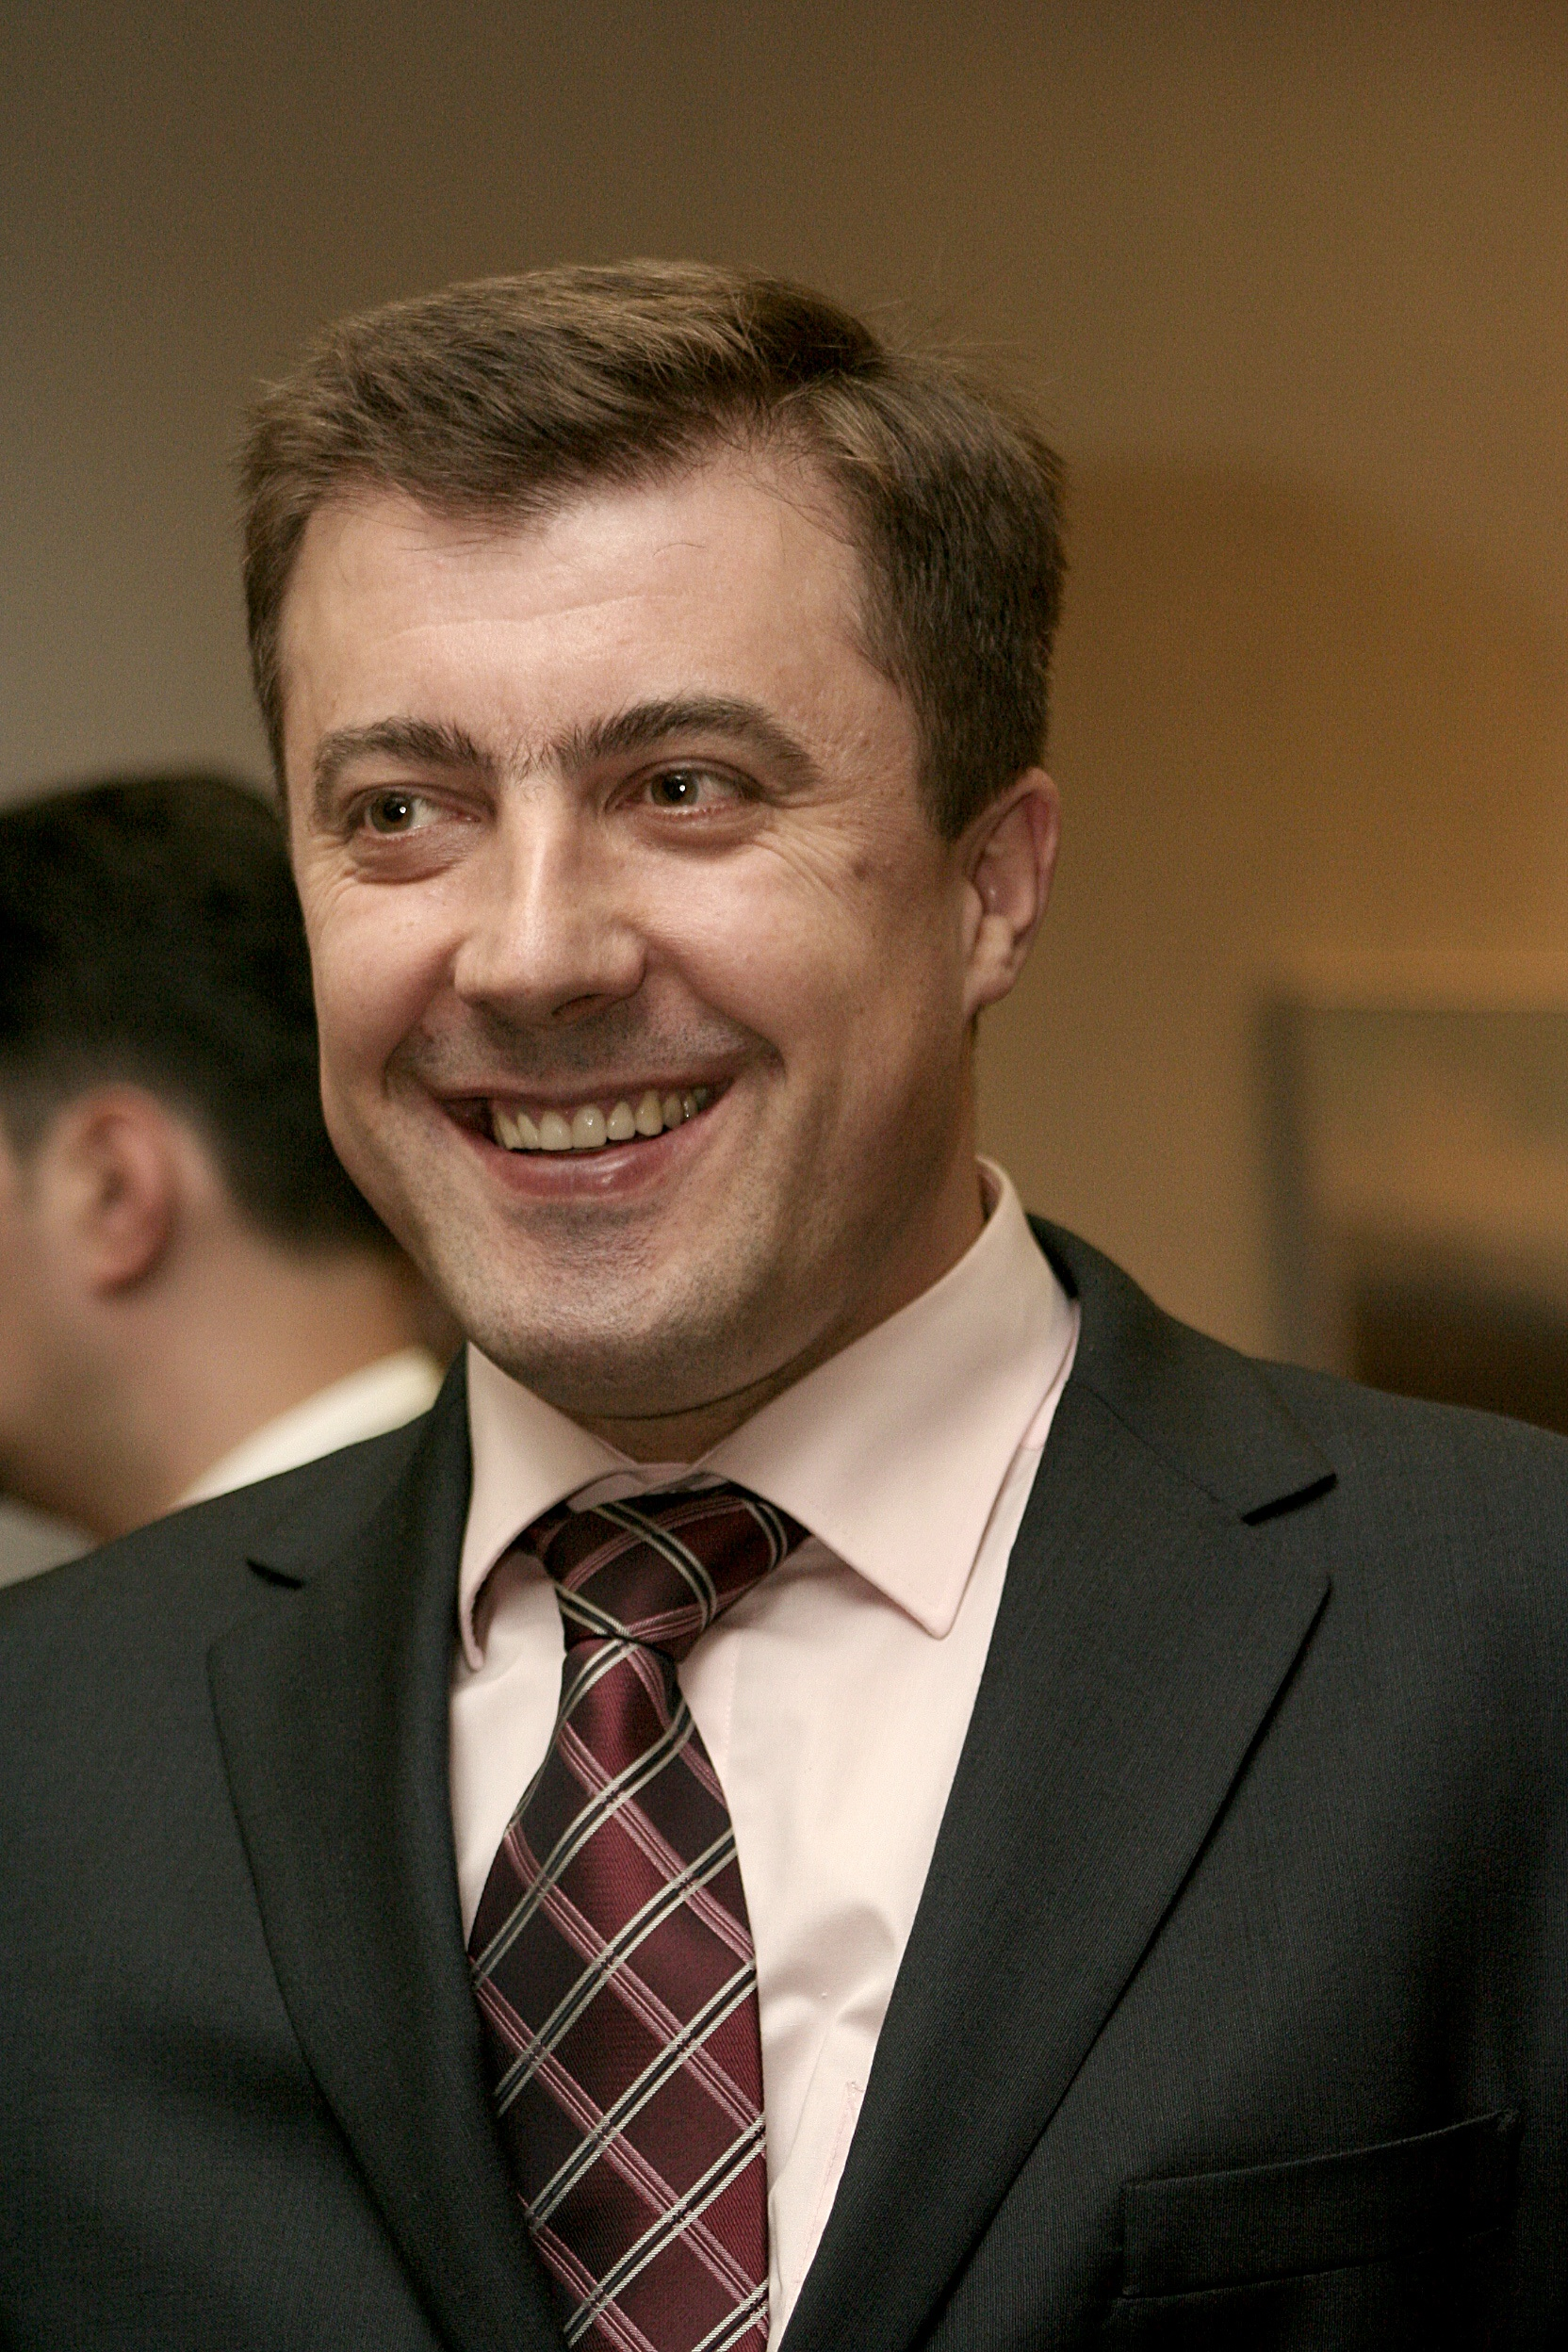 Tužilaštvo BiH optužilo Kemala Čauševića